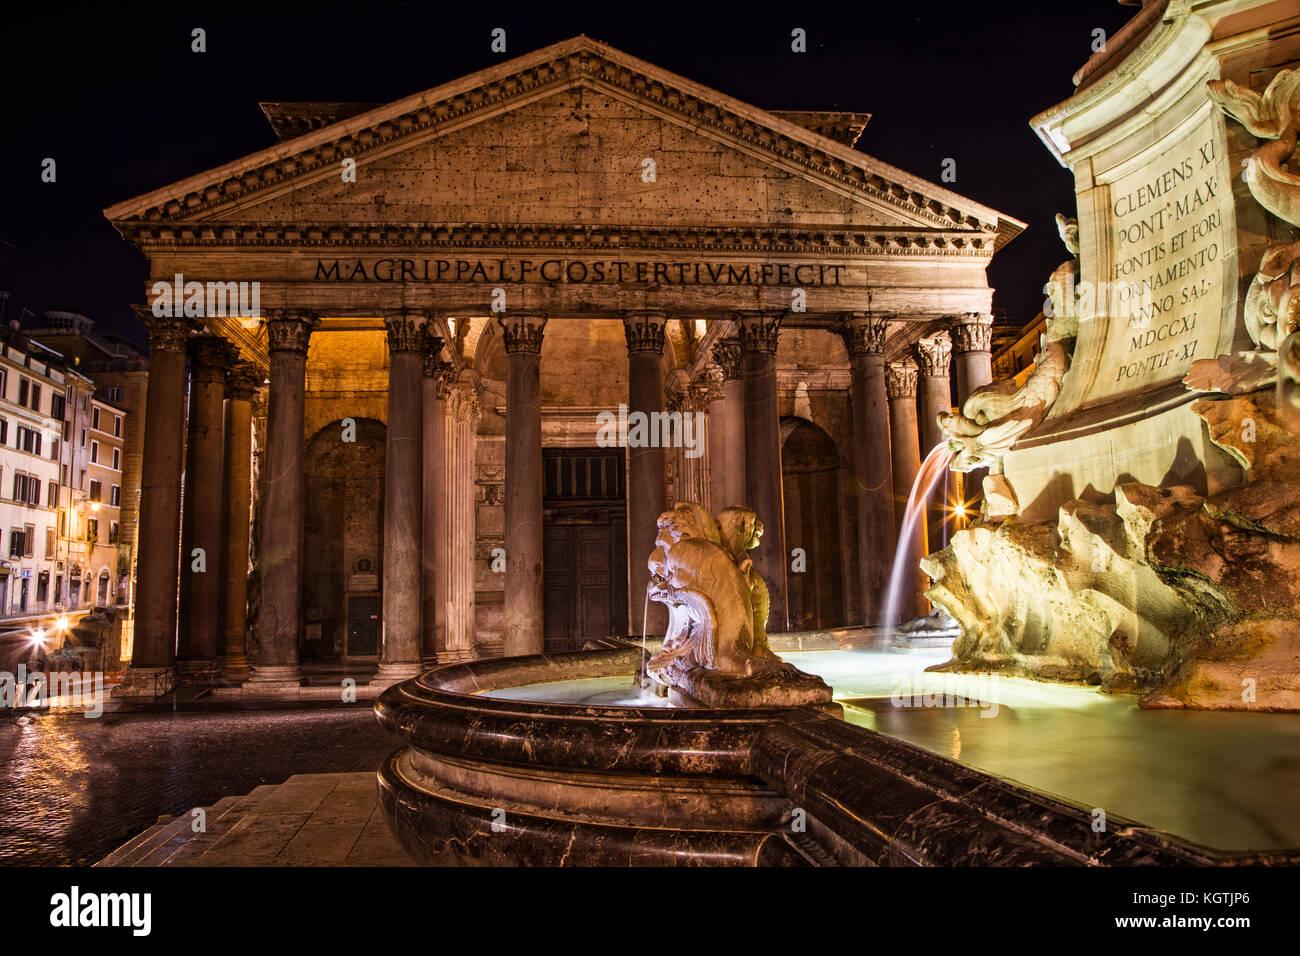 The Pantheon and Piazza della Rontonda, Rome, Italy. - Stock Image